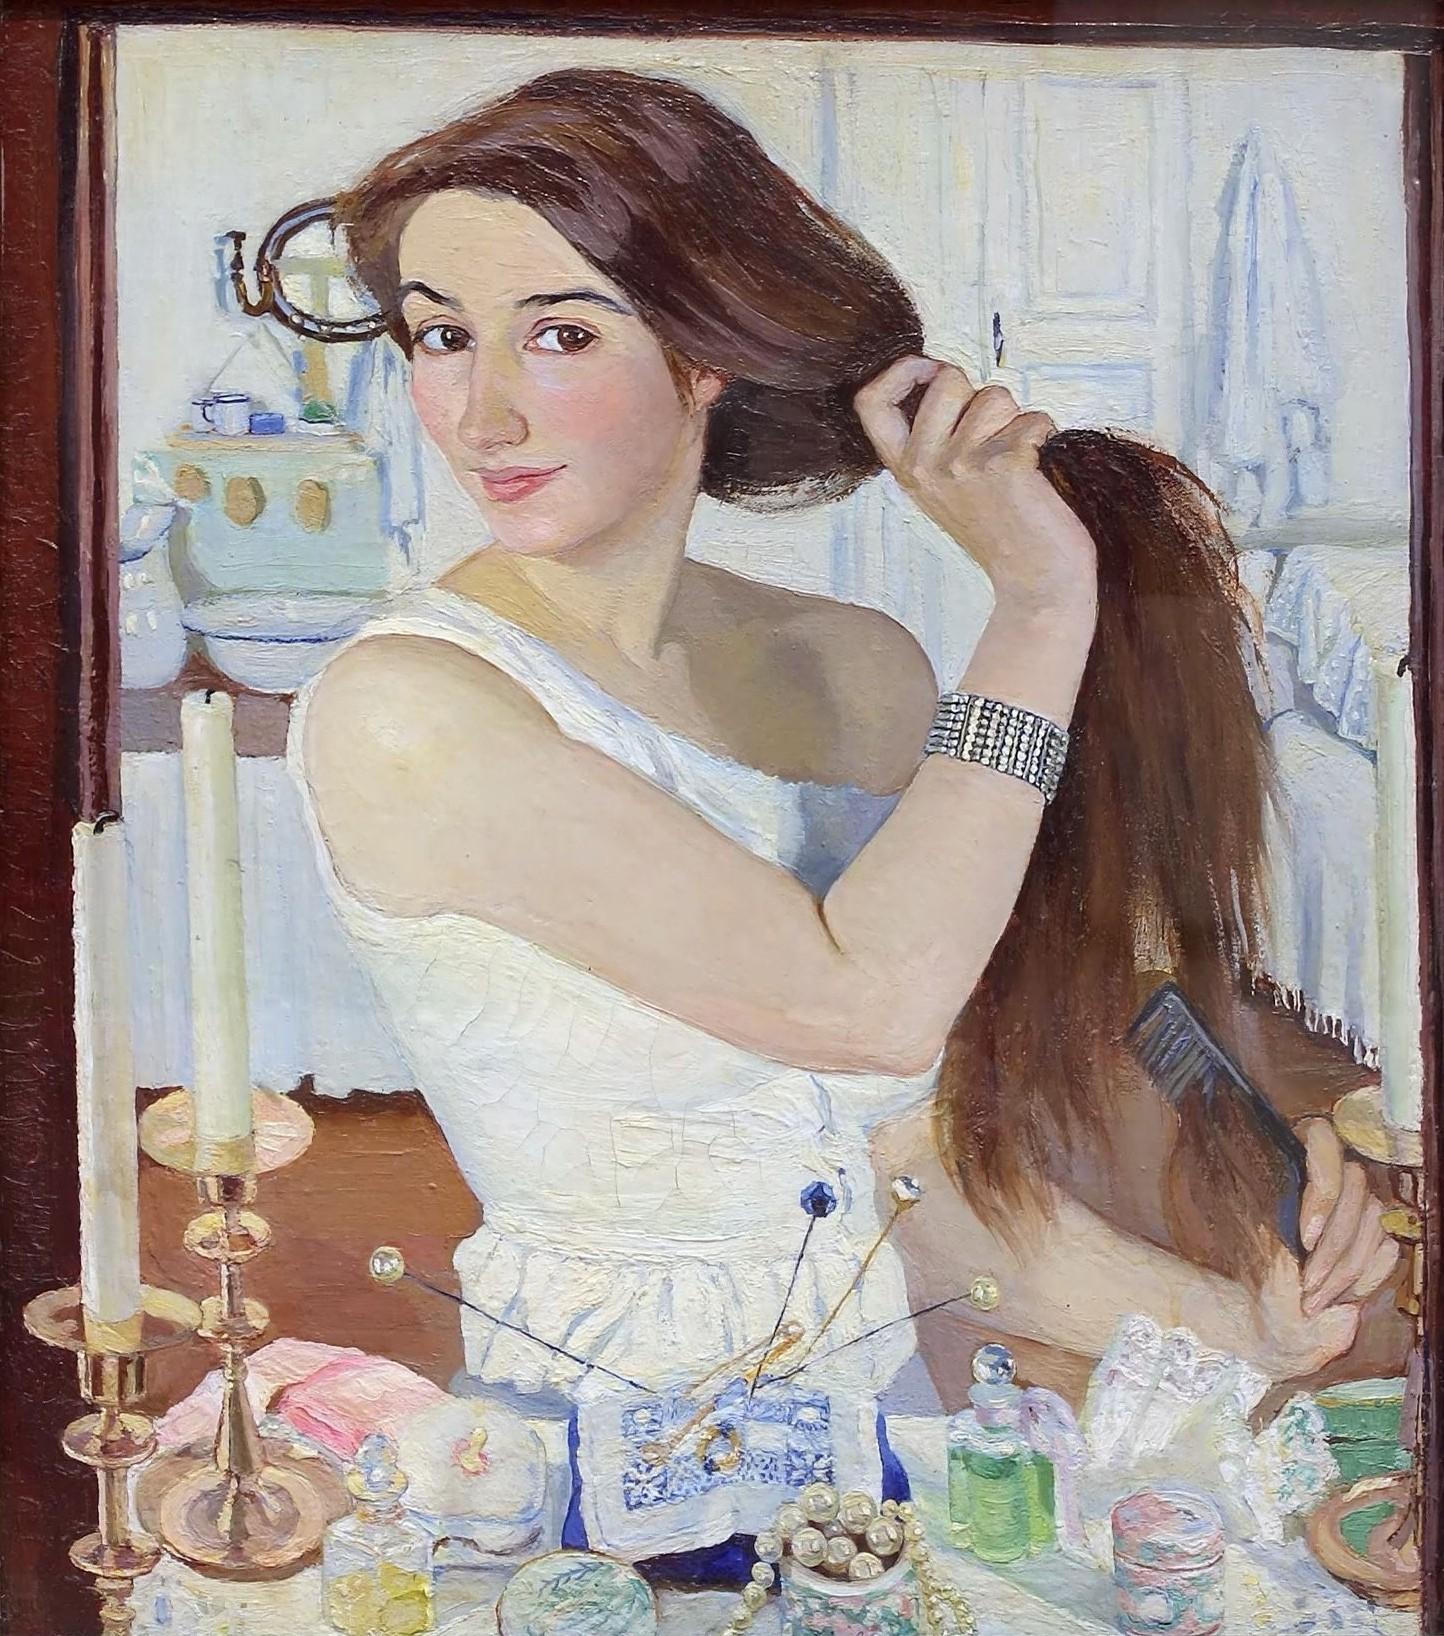 Серебрякова Зинаида Евгеньевна«Женский портрет» 1937 г.